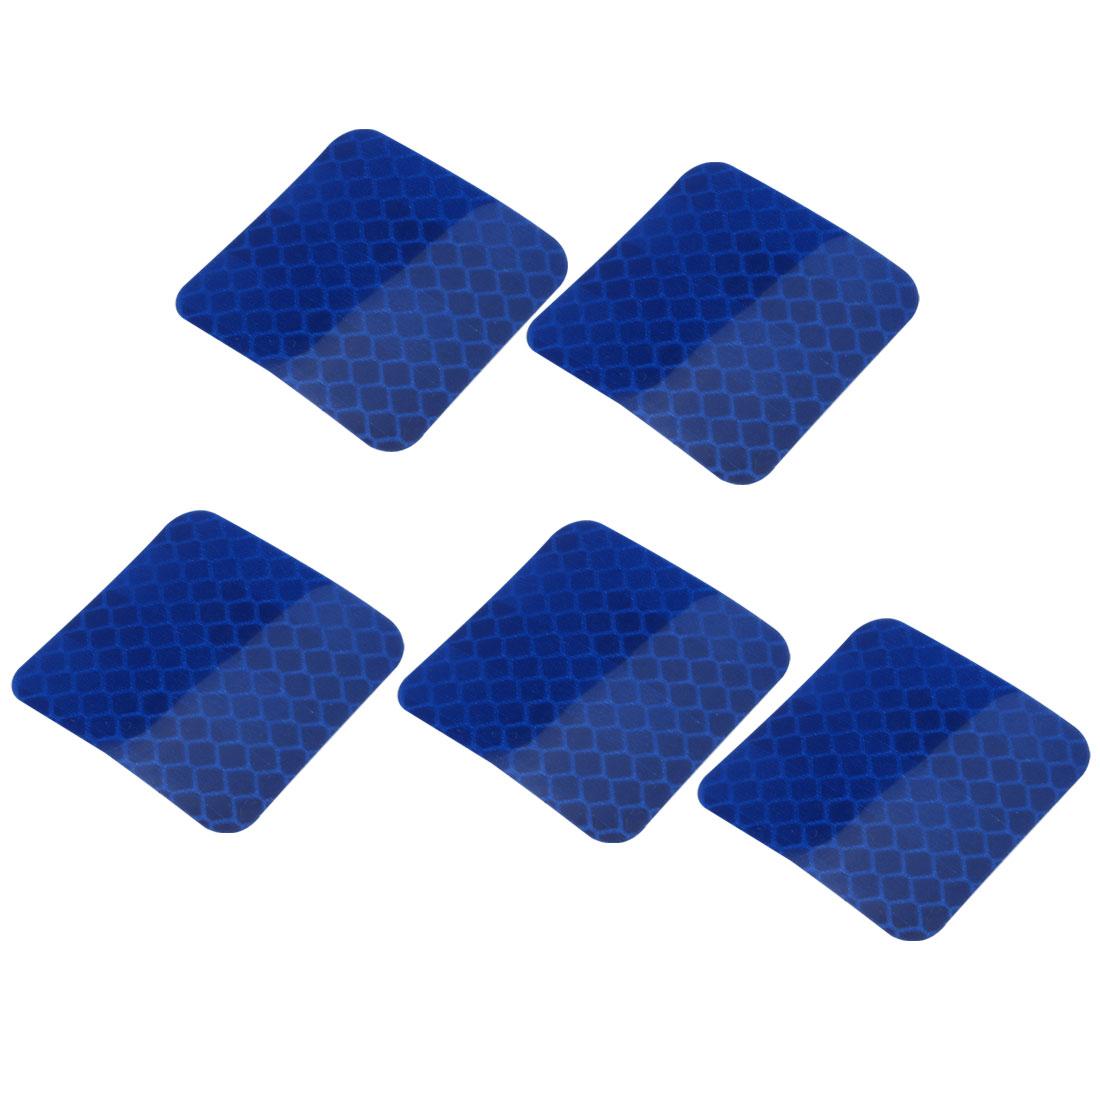 5pcs Honeycomb Reflective Warning Tape Film Sticker Blue 40mm x 40mm